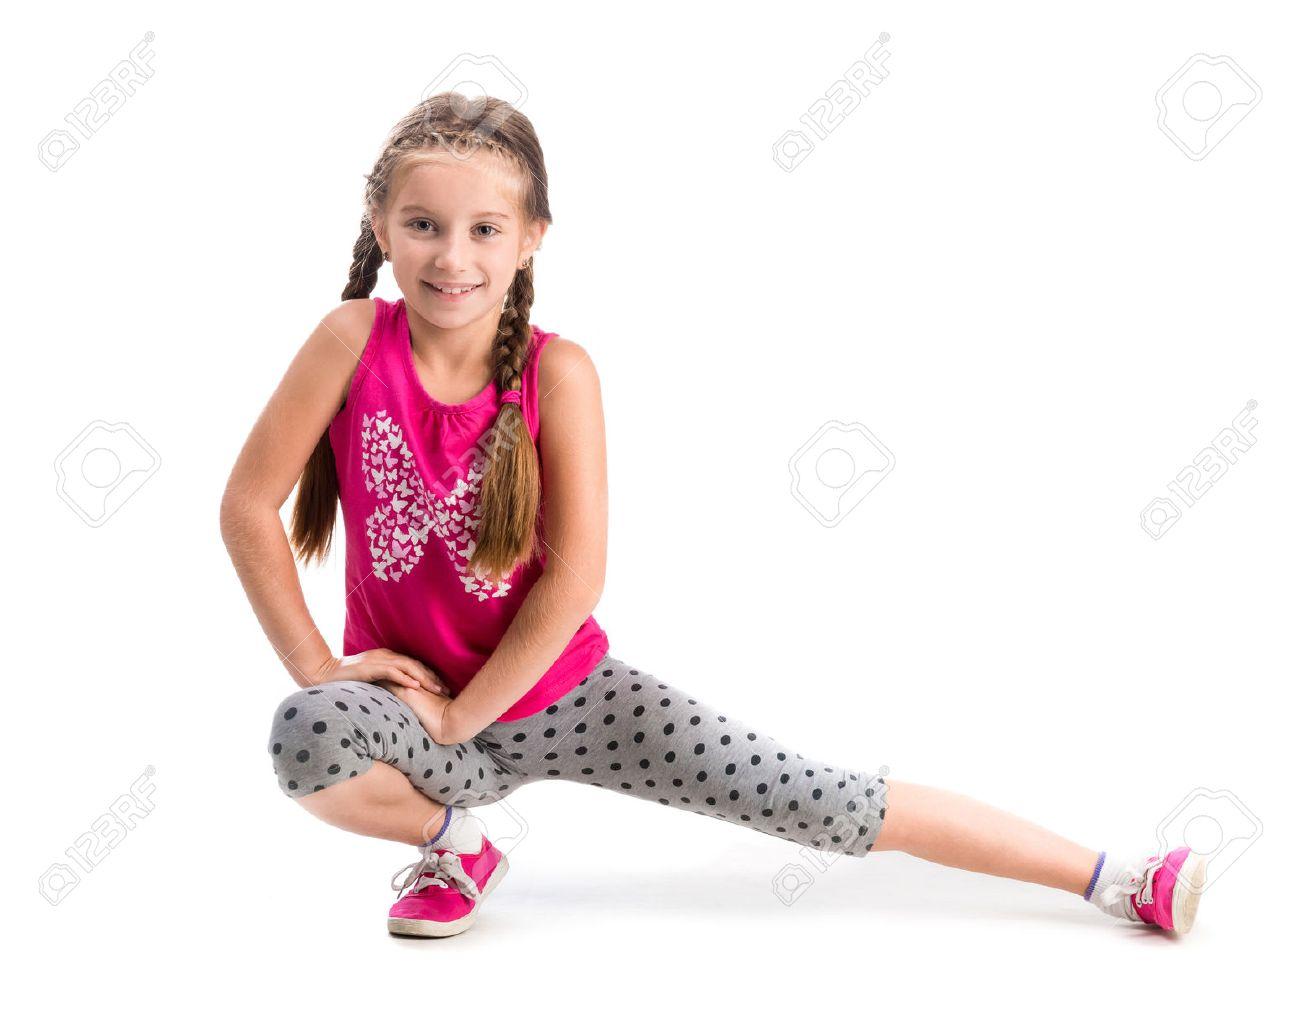 smiling little girl doing exercise isolated on white background - 44481647